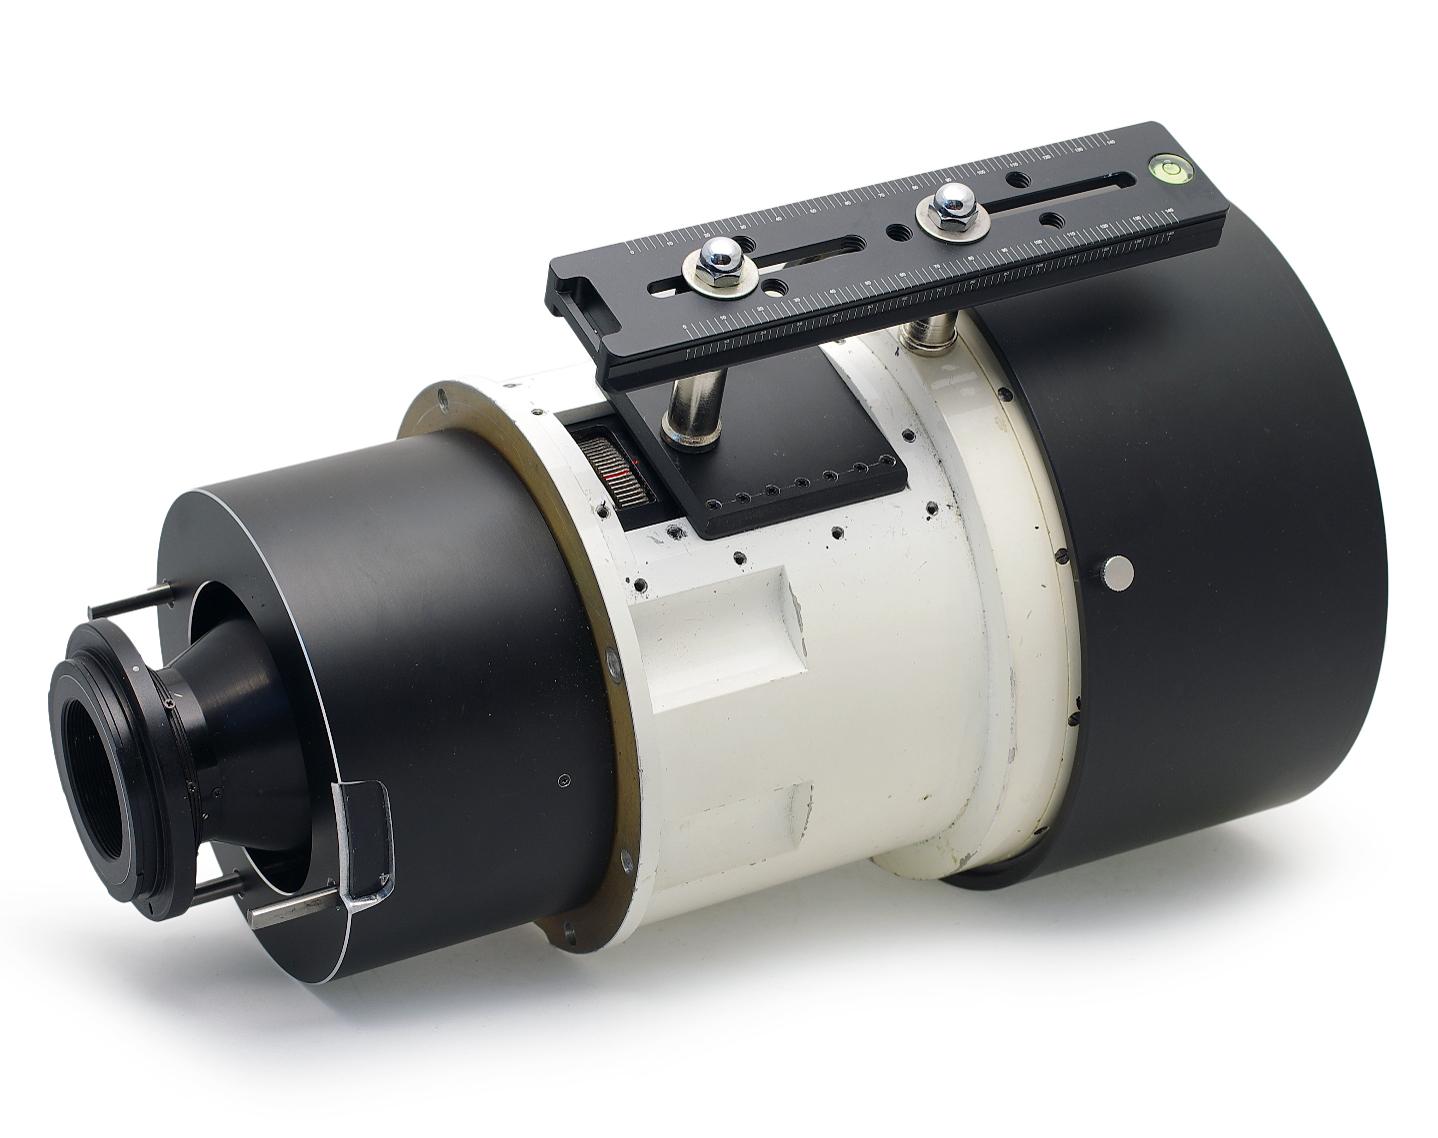 P-Angenieux-1-5-210-mm-Professional-re-mounted-to-Fujifilm-GFX Indexbild 6